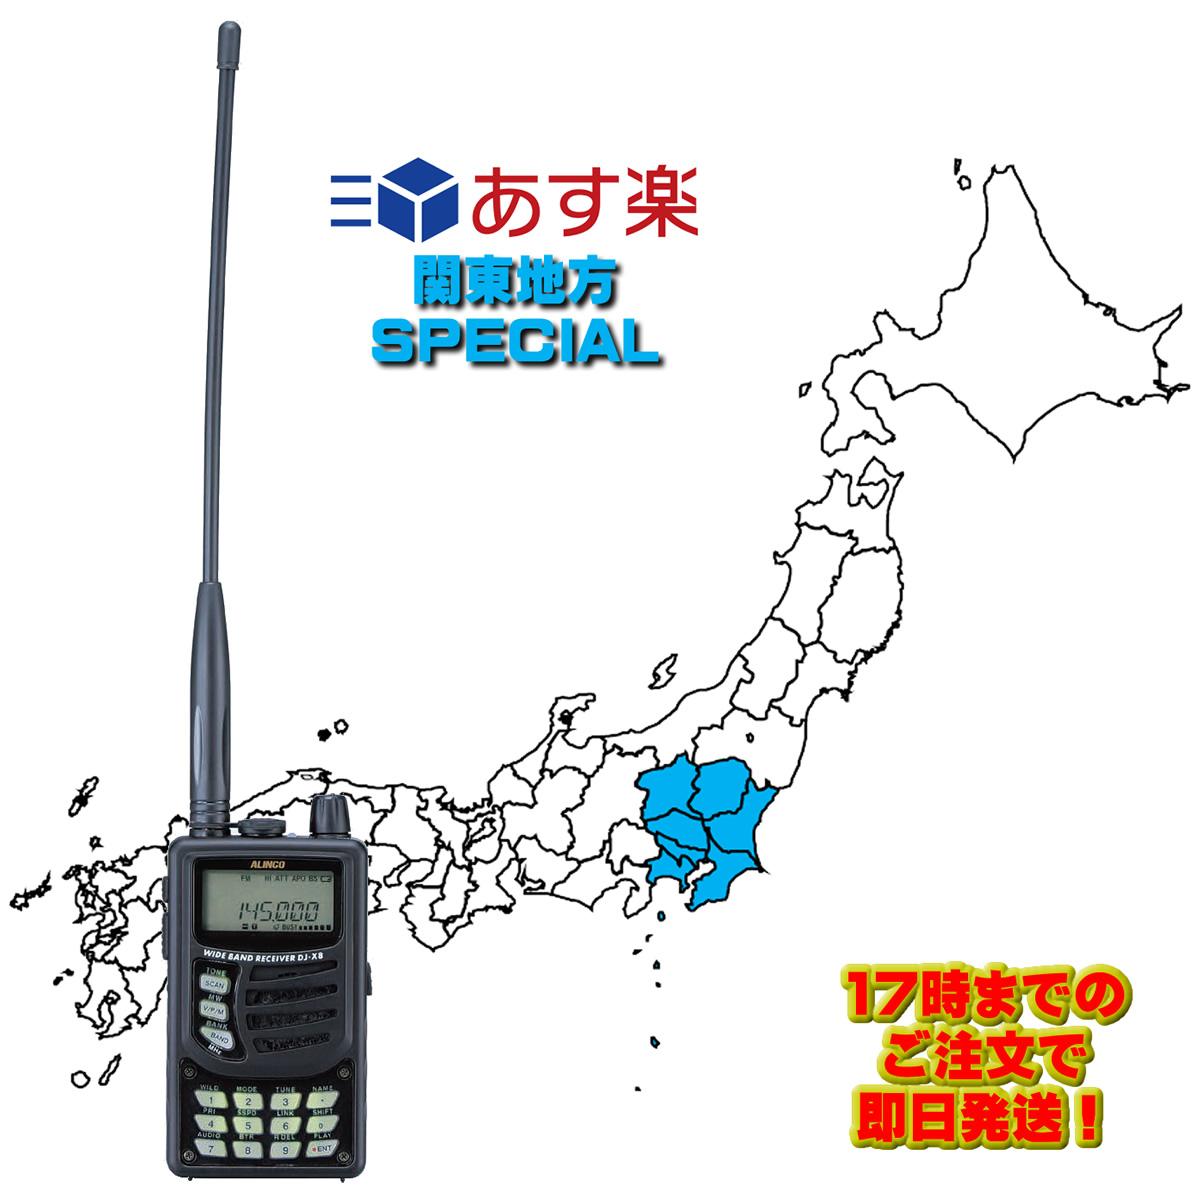 DJ-X8 関東地方SPECIAL アルインコ ワイドバンドコミュニケーションレシーバー 980chメモリー書込み済!